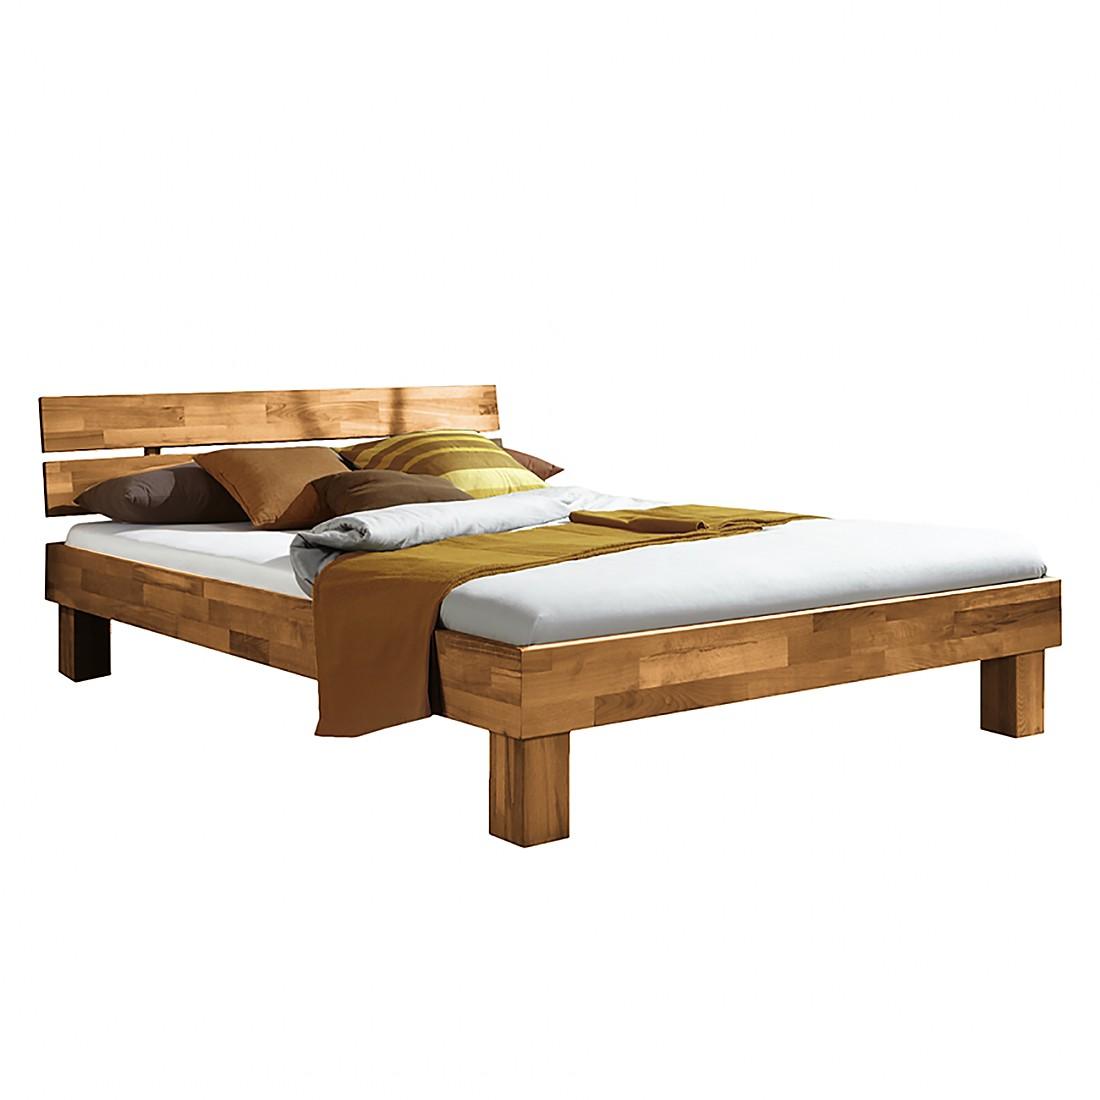 goedkoop Massief houten bed SonaWOOD geolied massief wild eikenhout 90 x 200cm Ars Natura